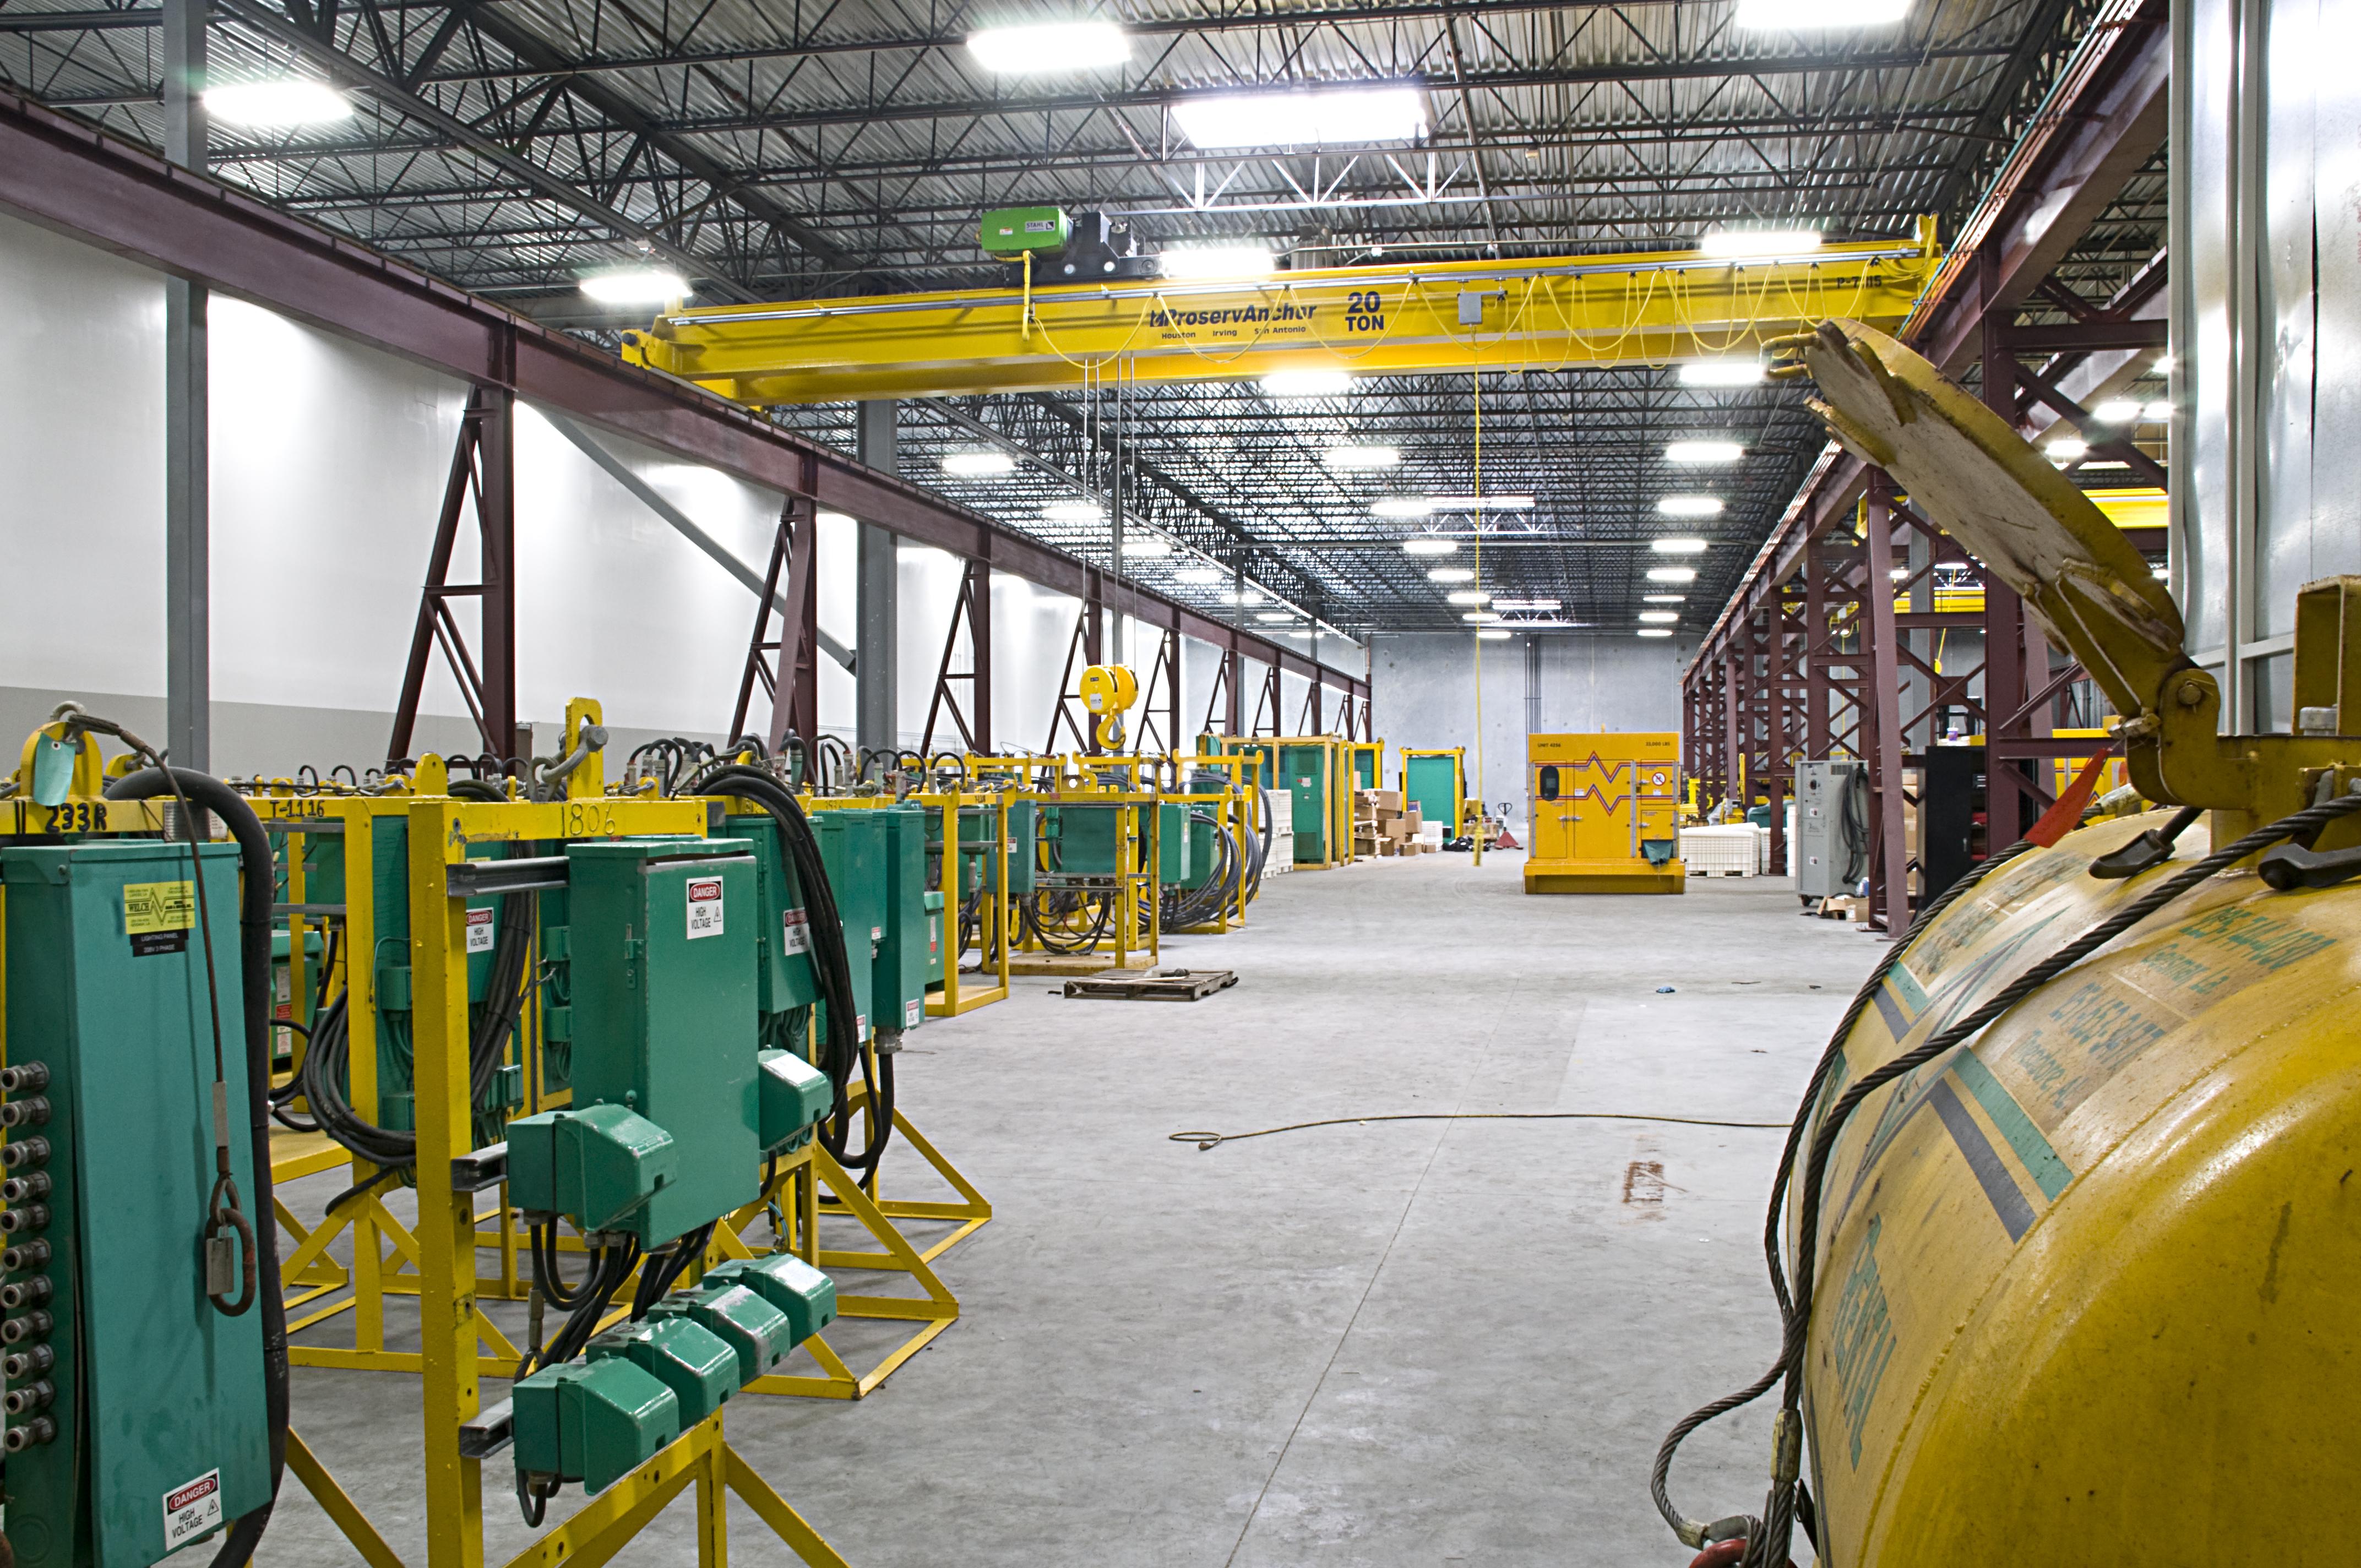 NOV Warehouse & Distribution